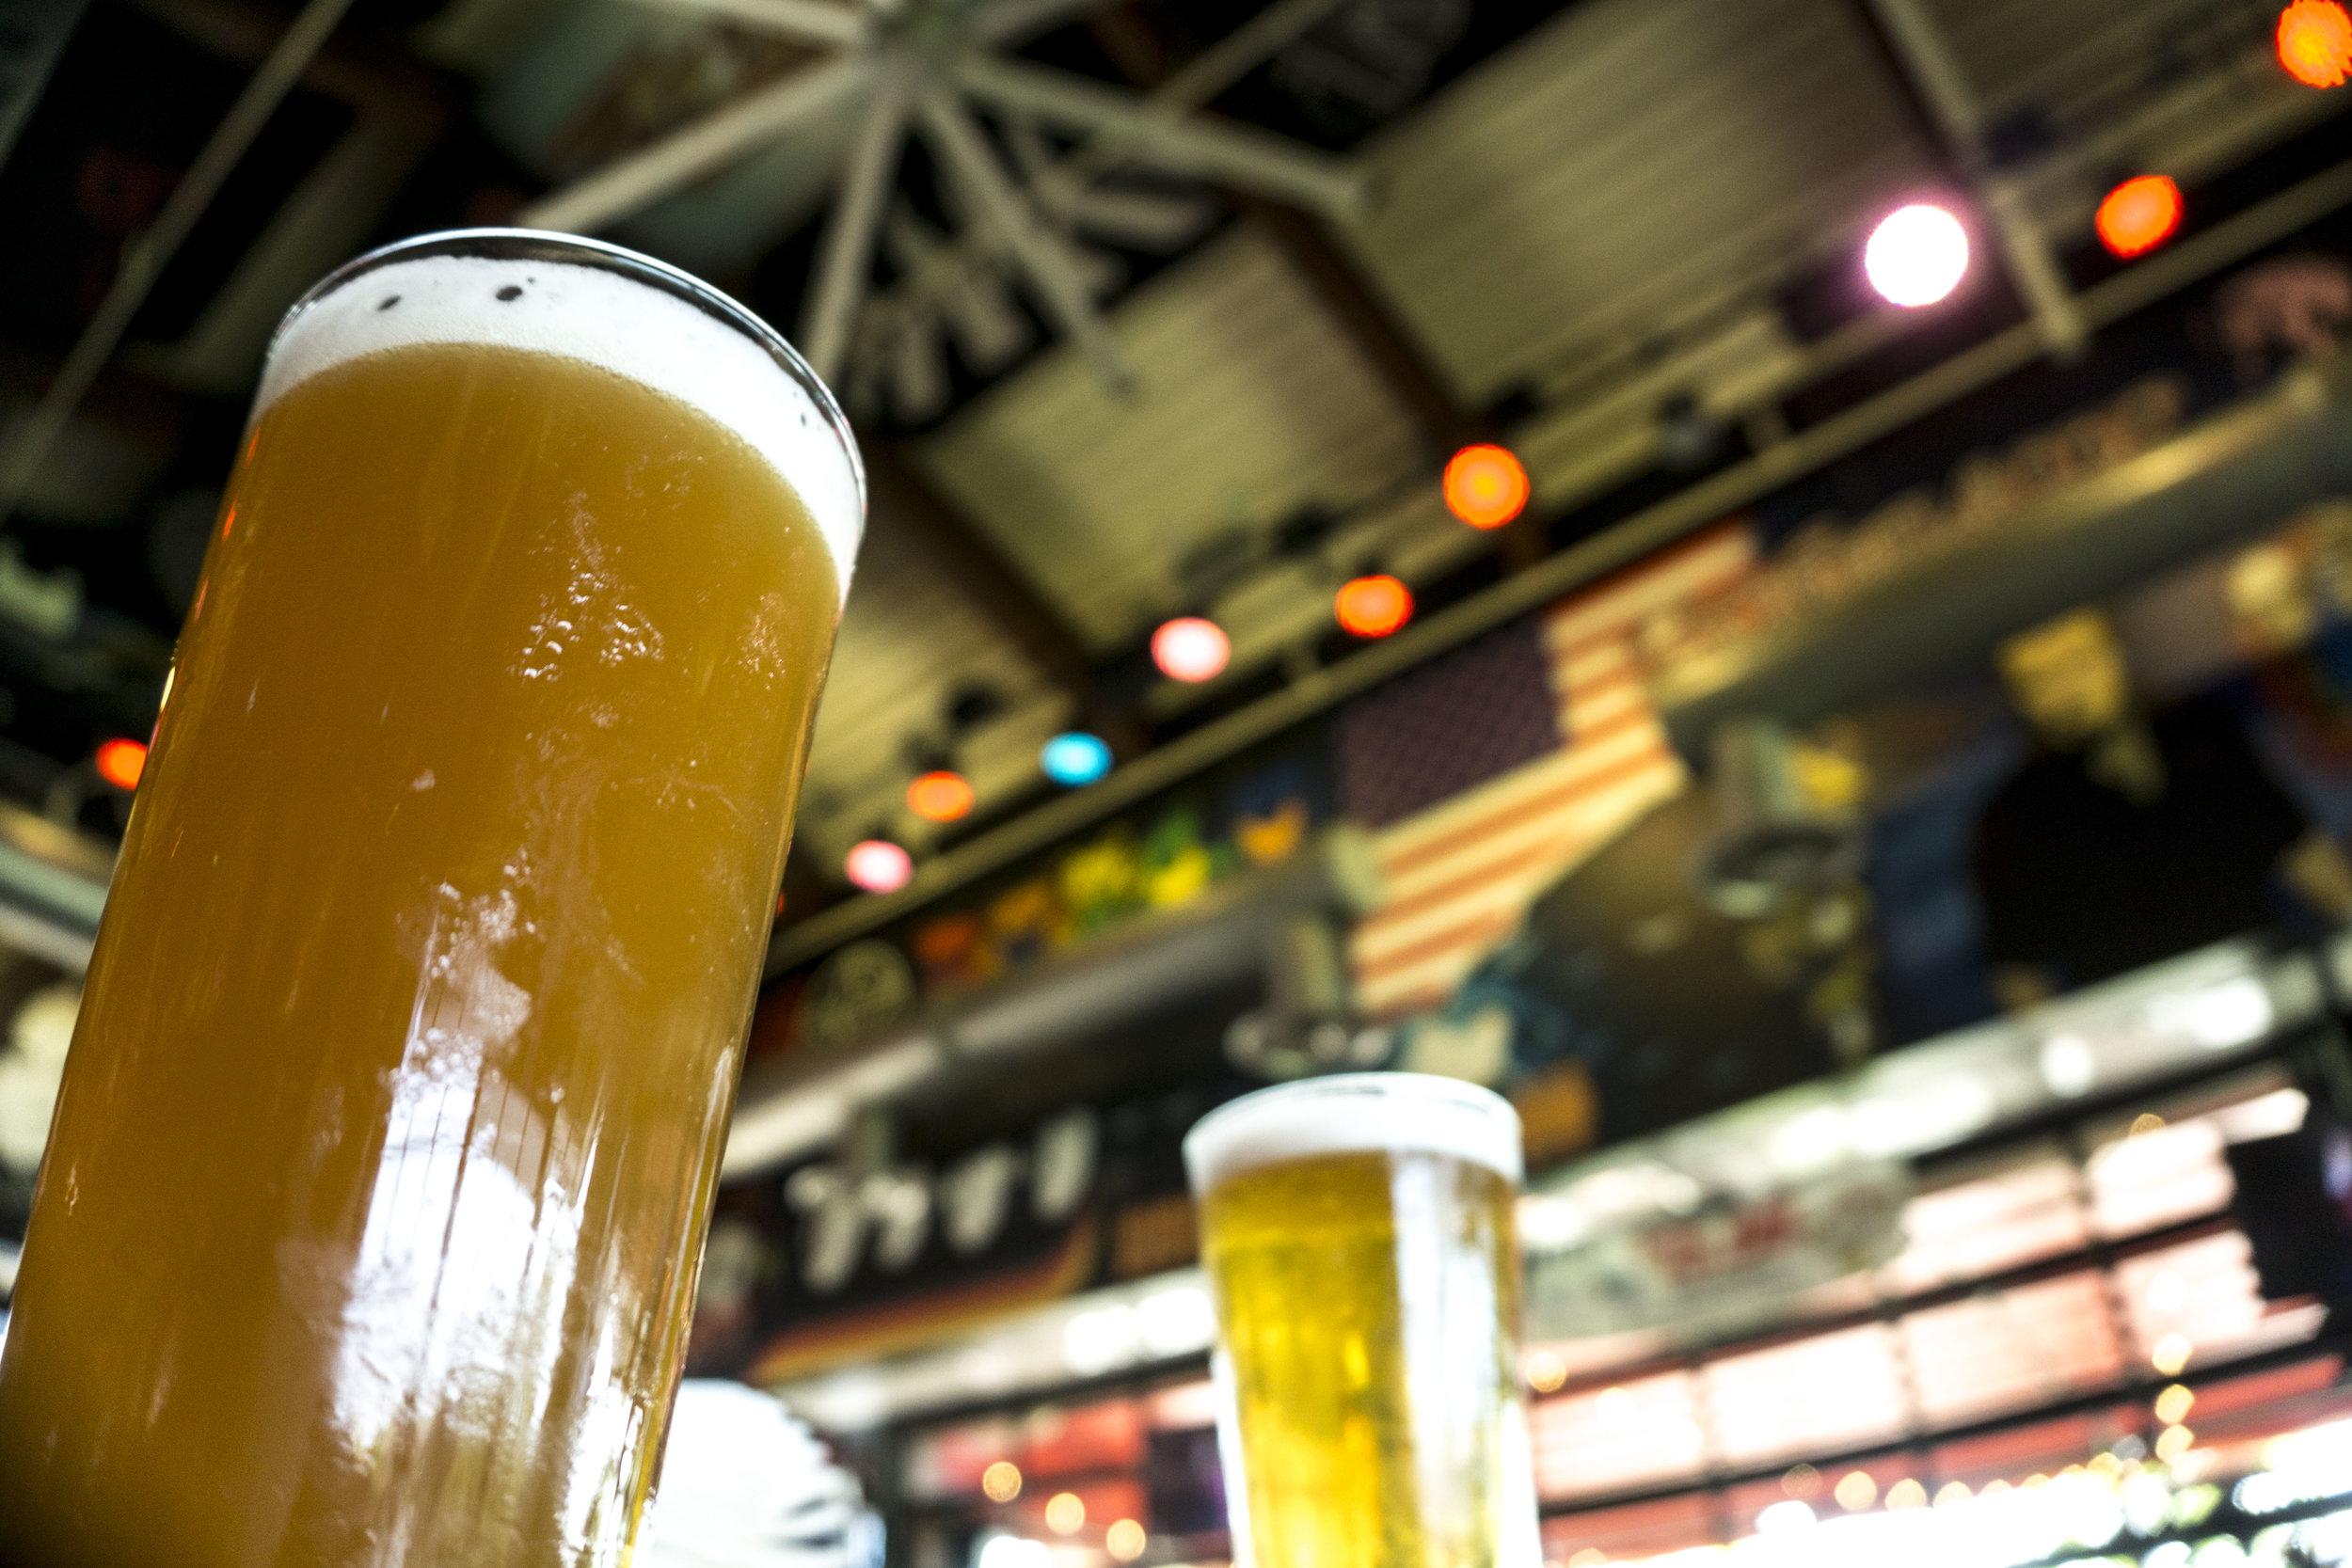 Beer with lights.jpg